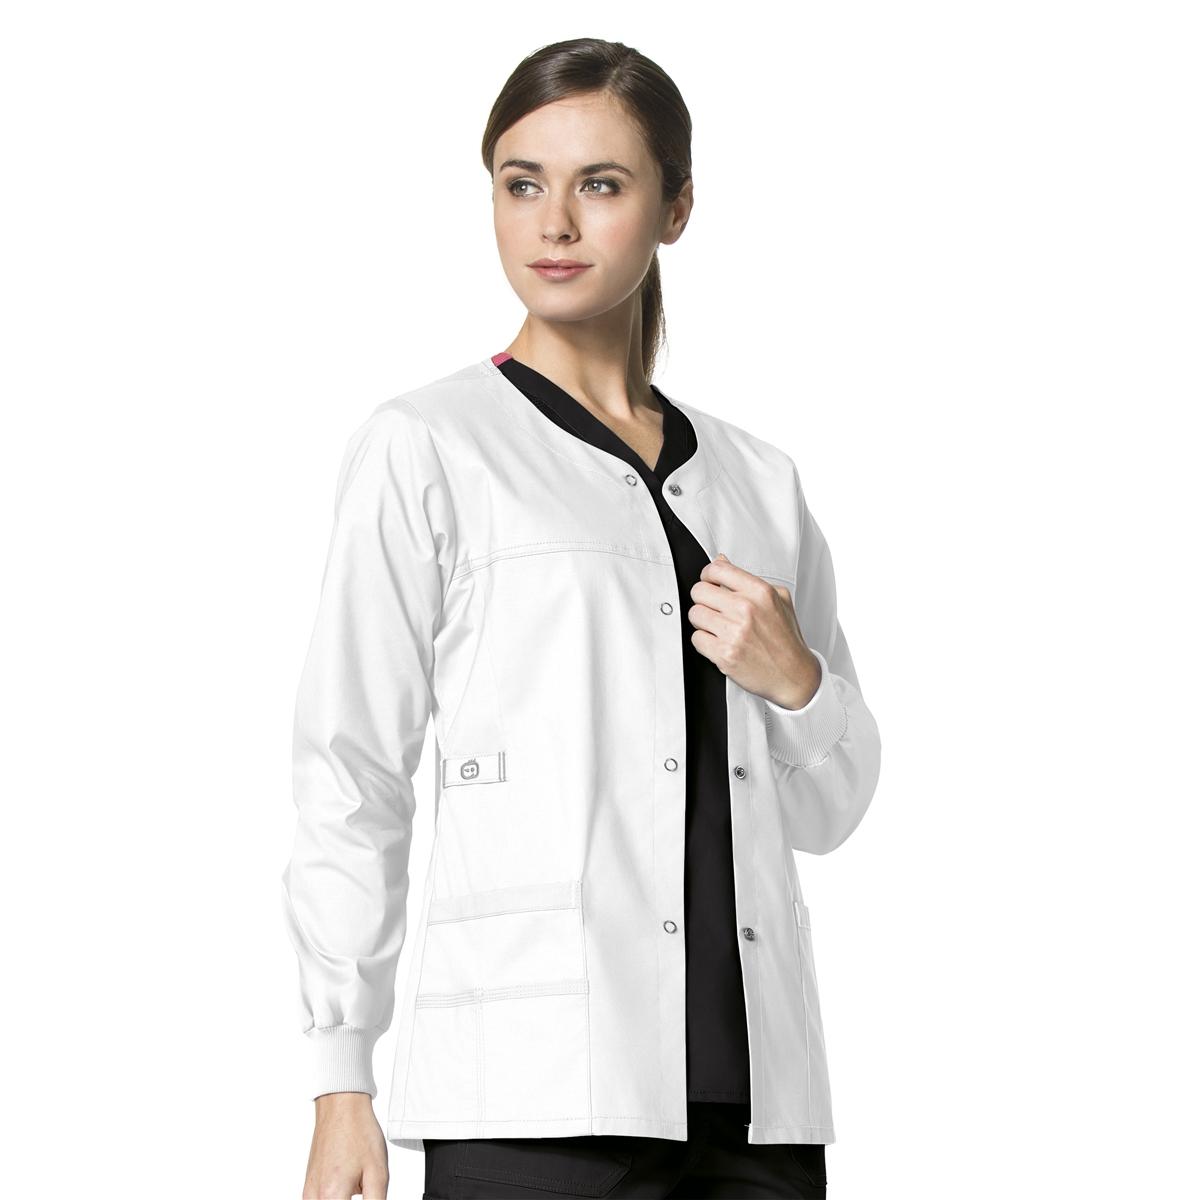 1282f6a705 WonderFLEX Constance Snap Jacket in True White - WonderWink Scrubs